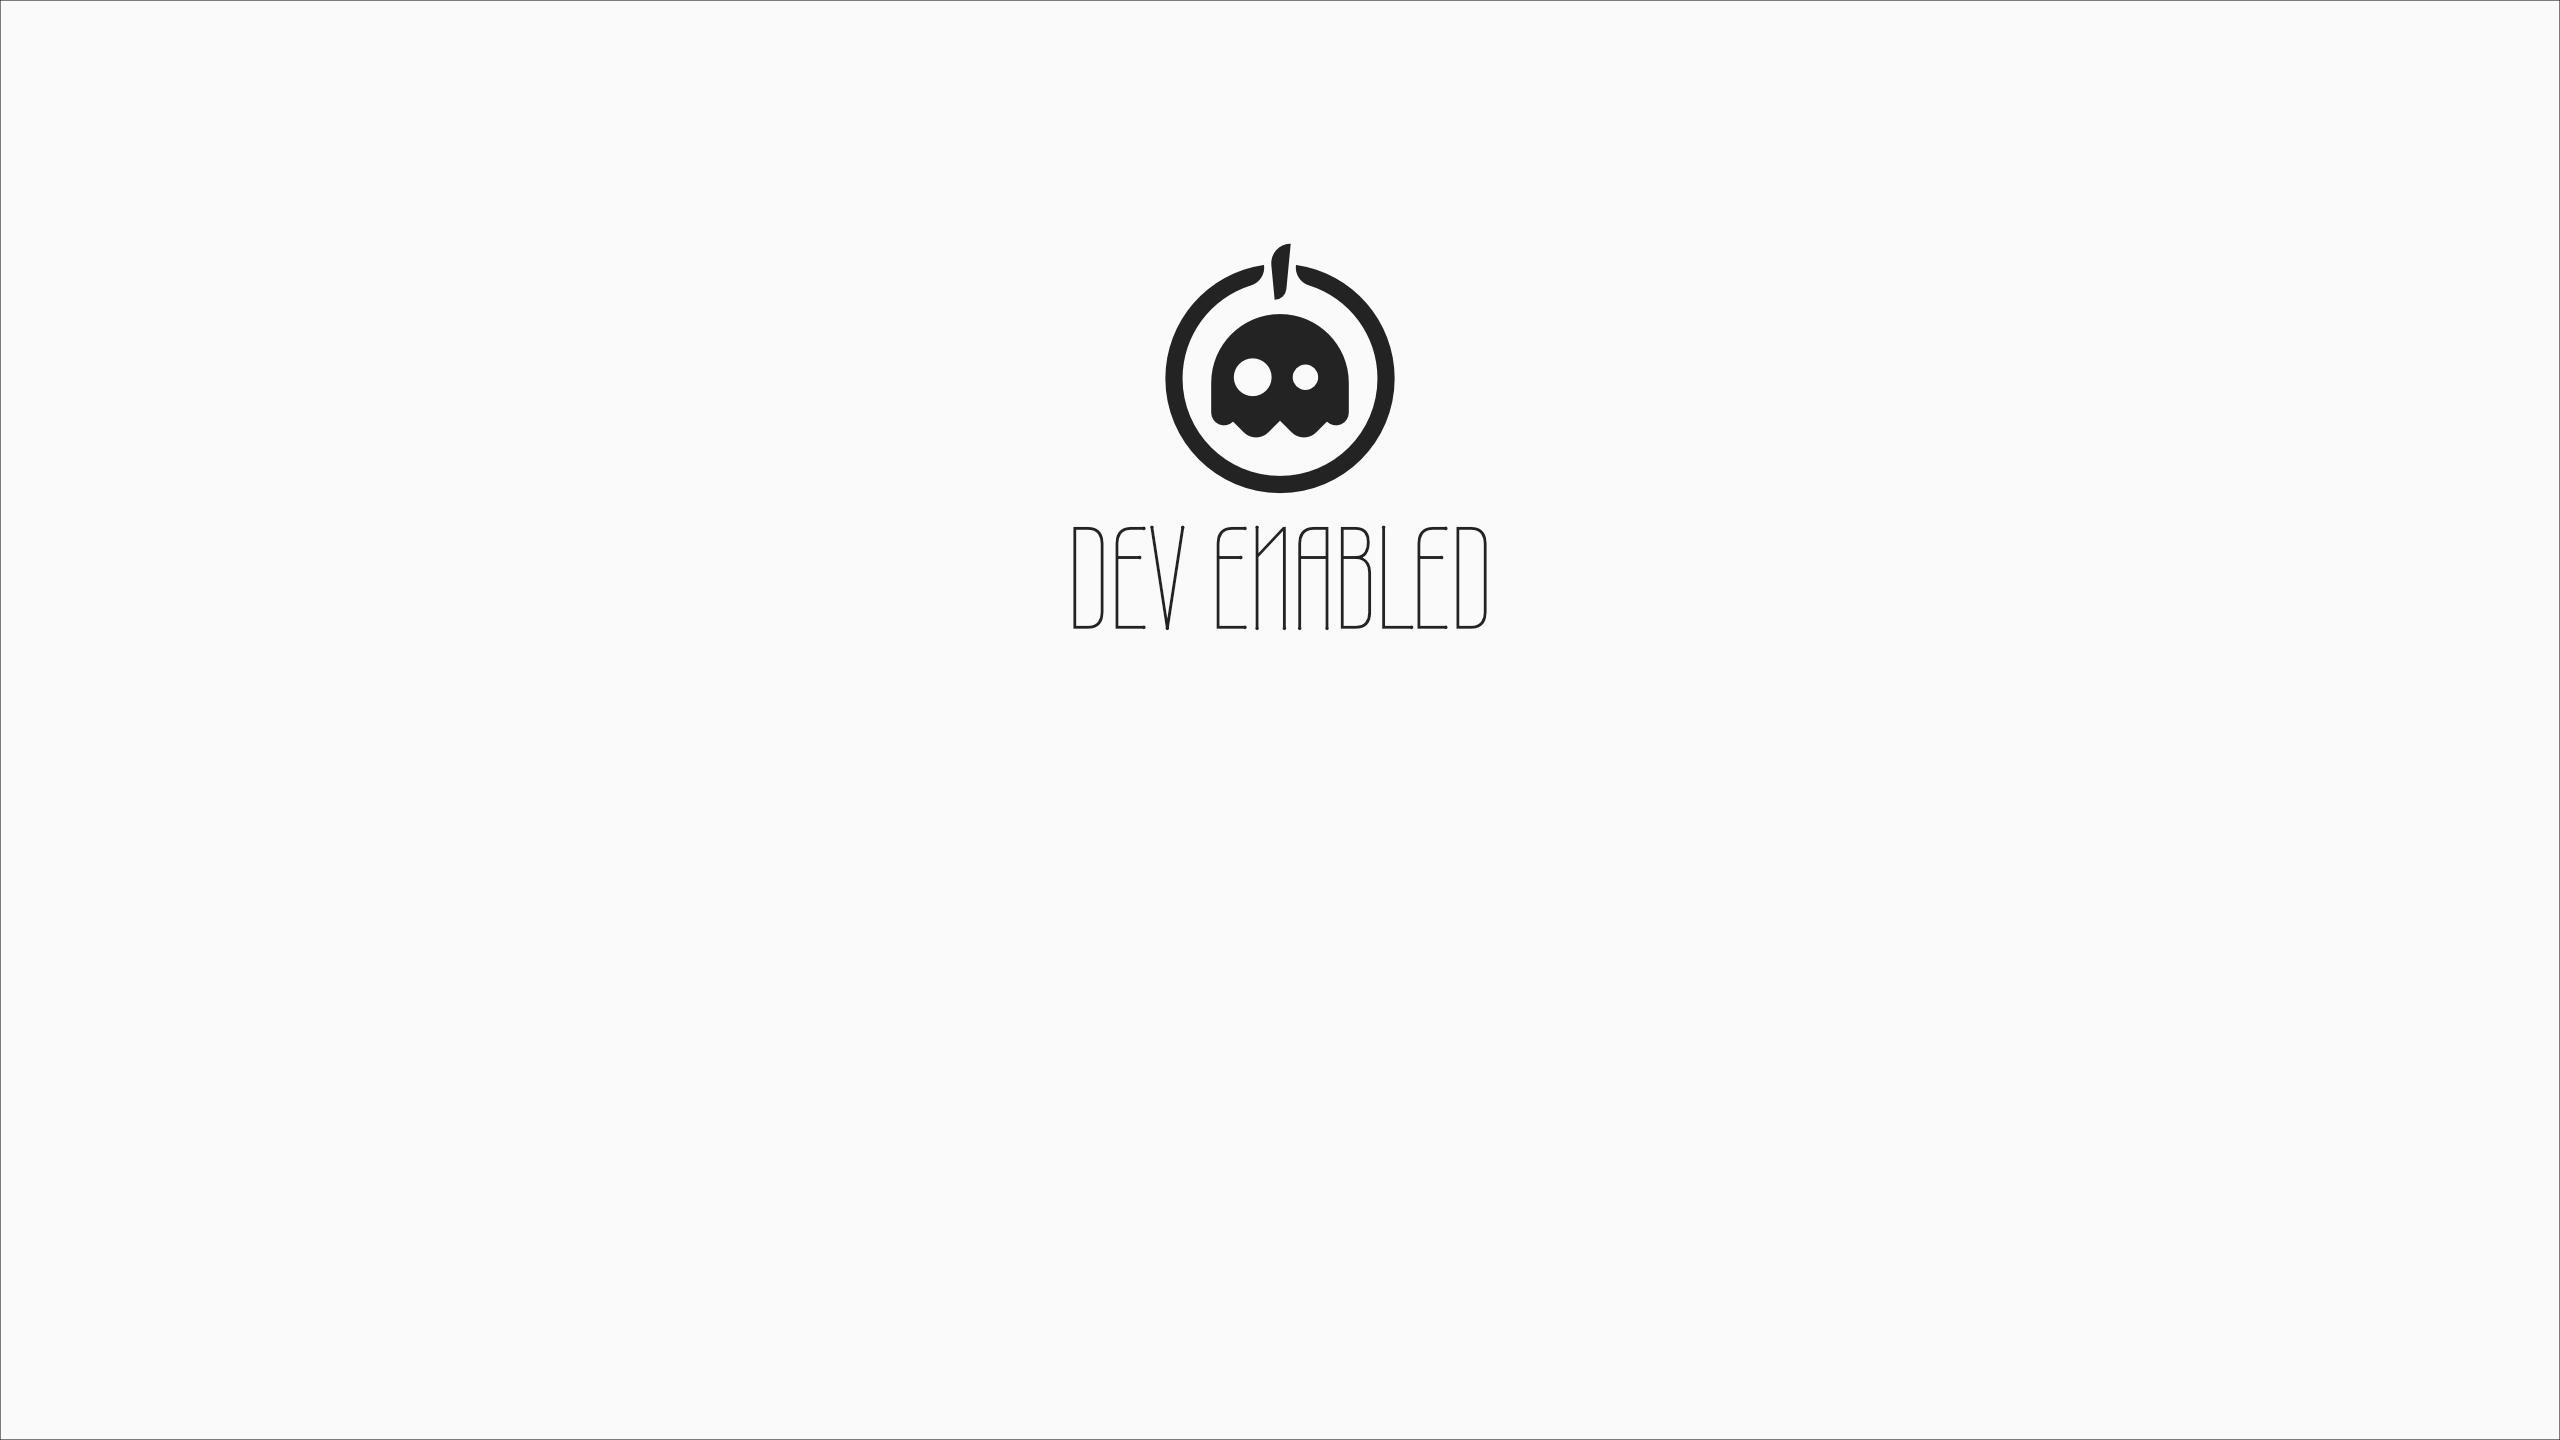 Dev Enabled